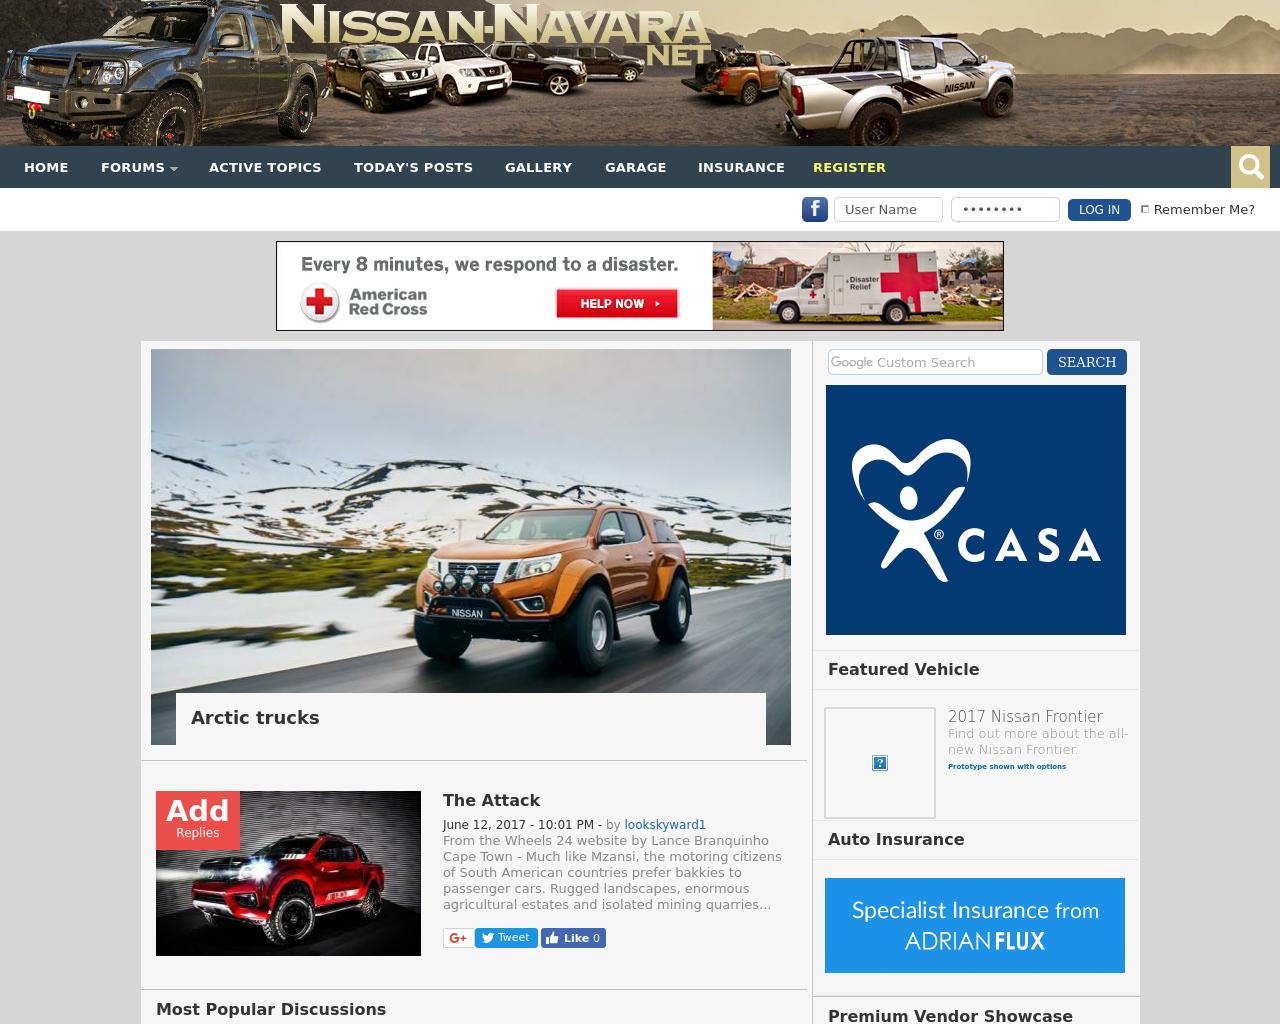 Nissan-Navara-Advertising-Reviews-Pricing